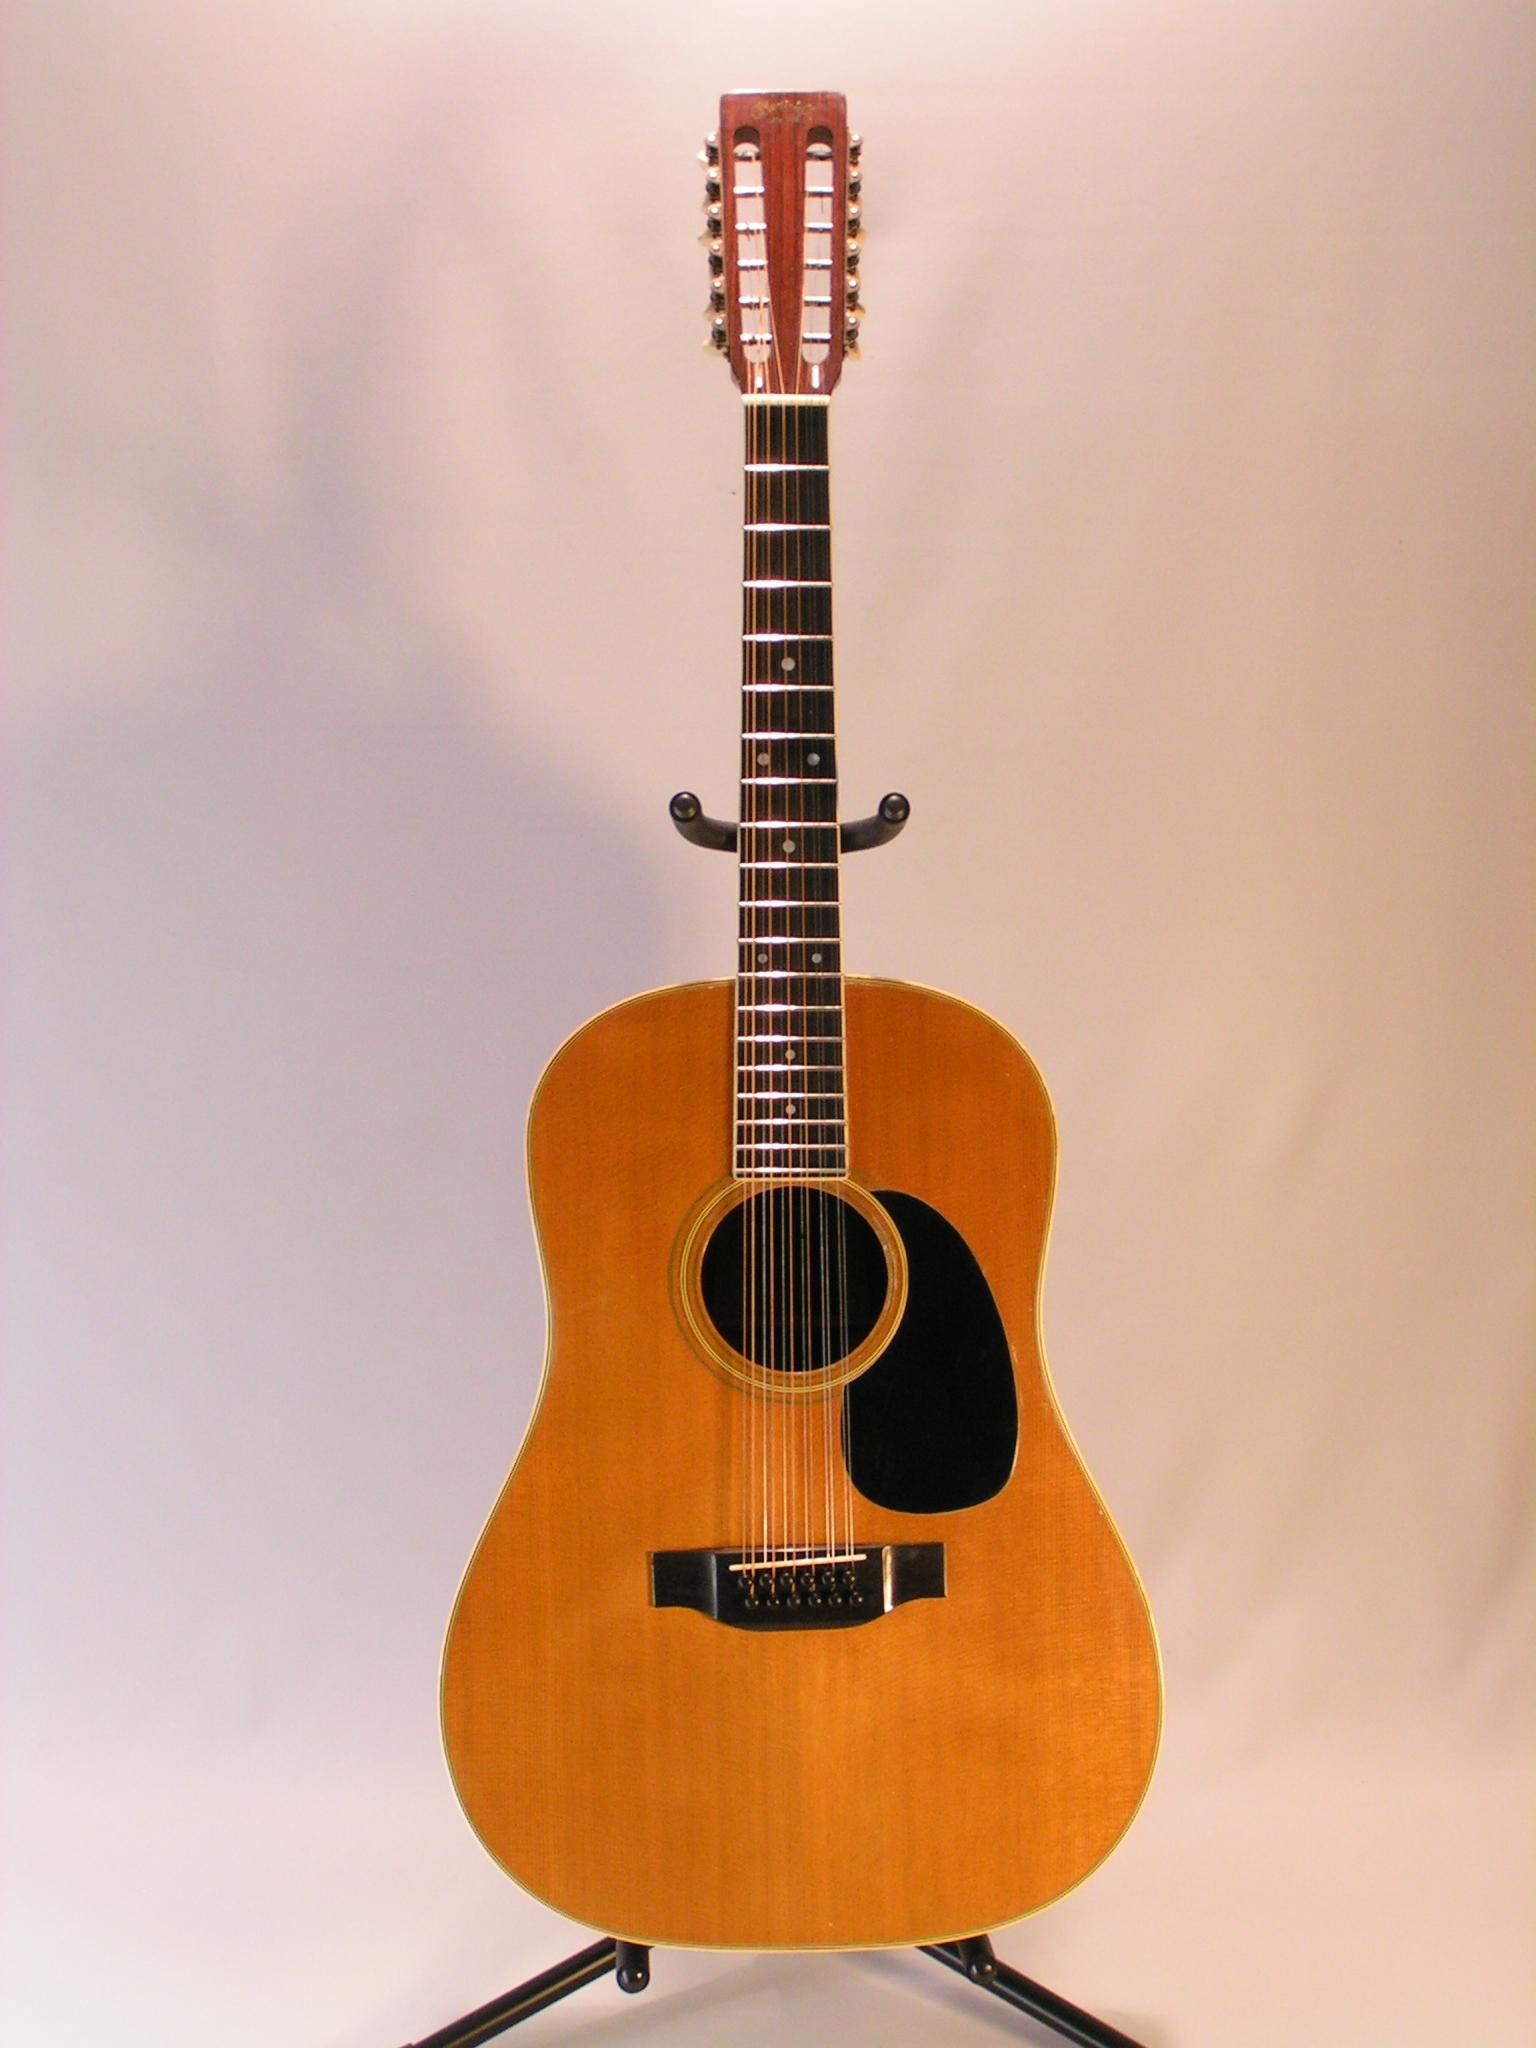 martin d12 35 de 1971 annonce guitare martin. Black Bedroom Furniture Sets. Home Design Ideas